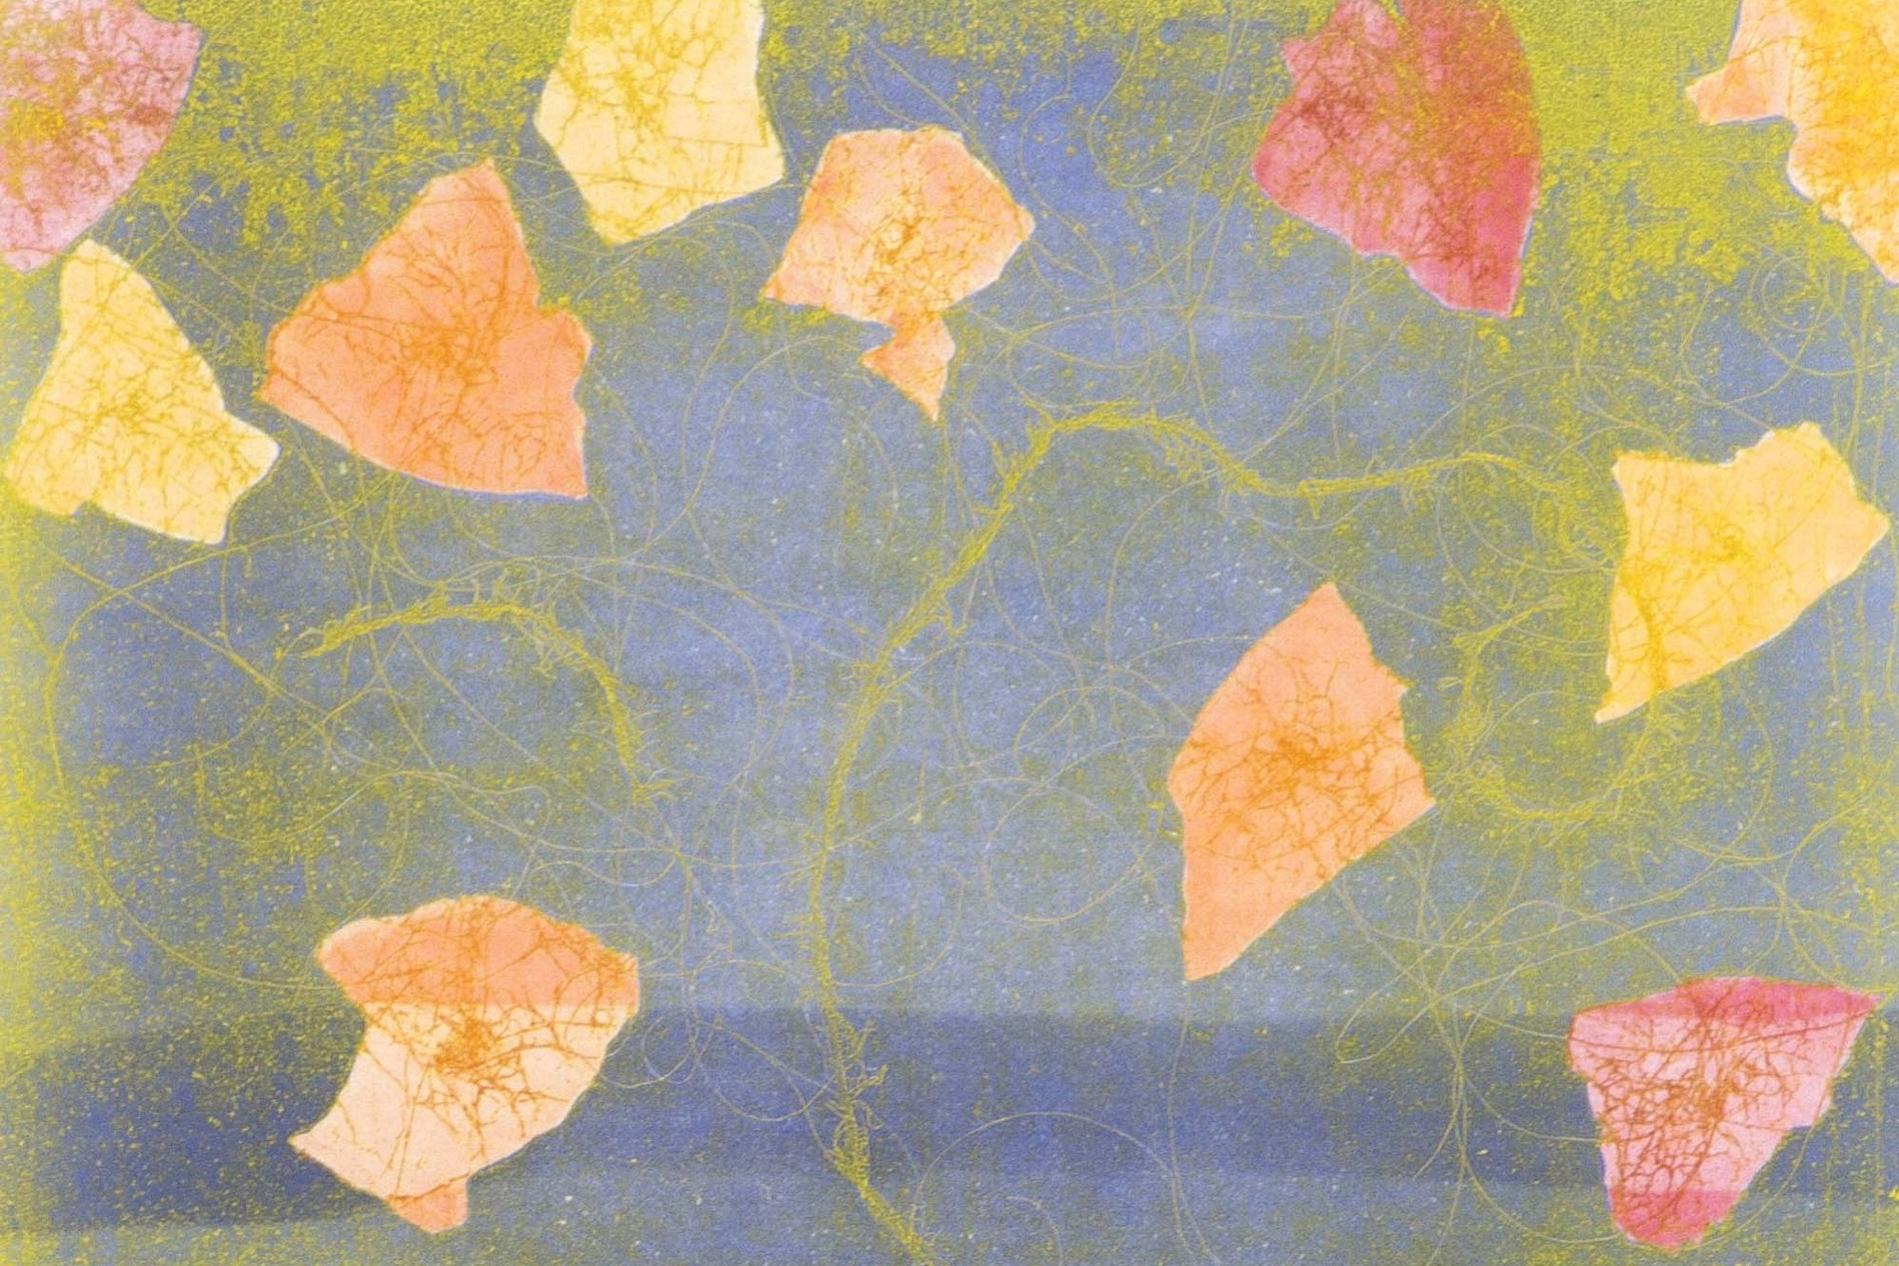 new-york-school-of-the-arts-taka-maruno-printmaking-3.jpg